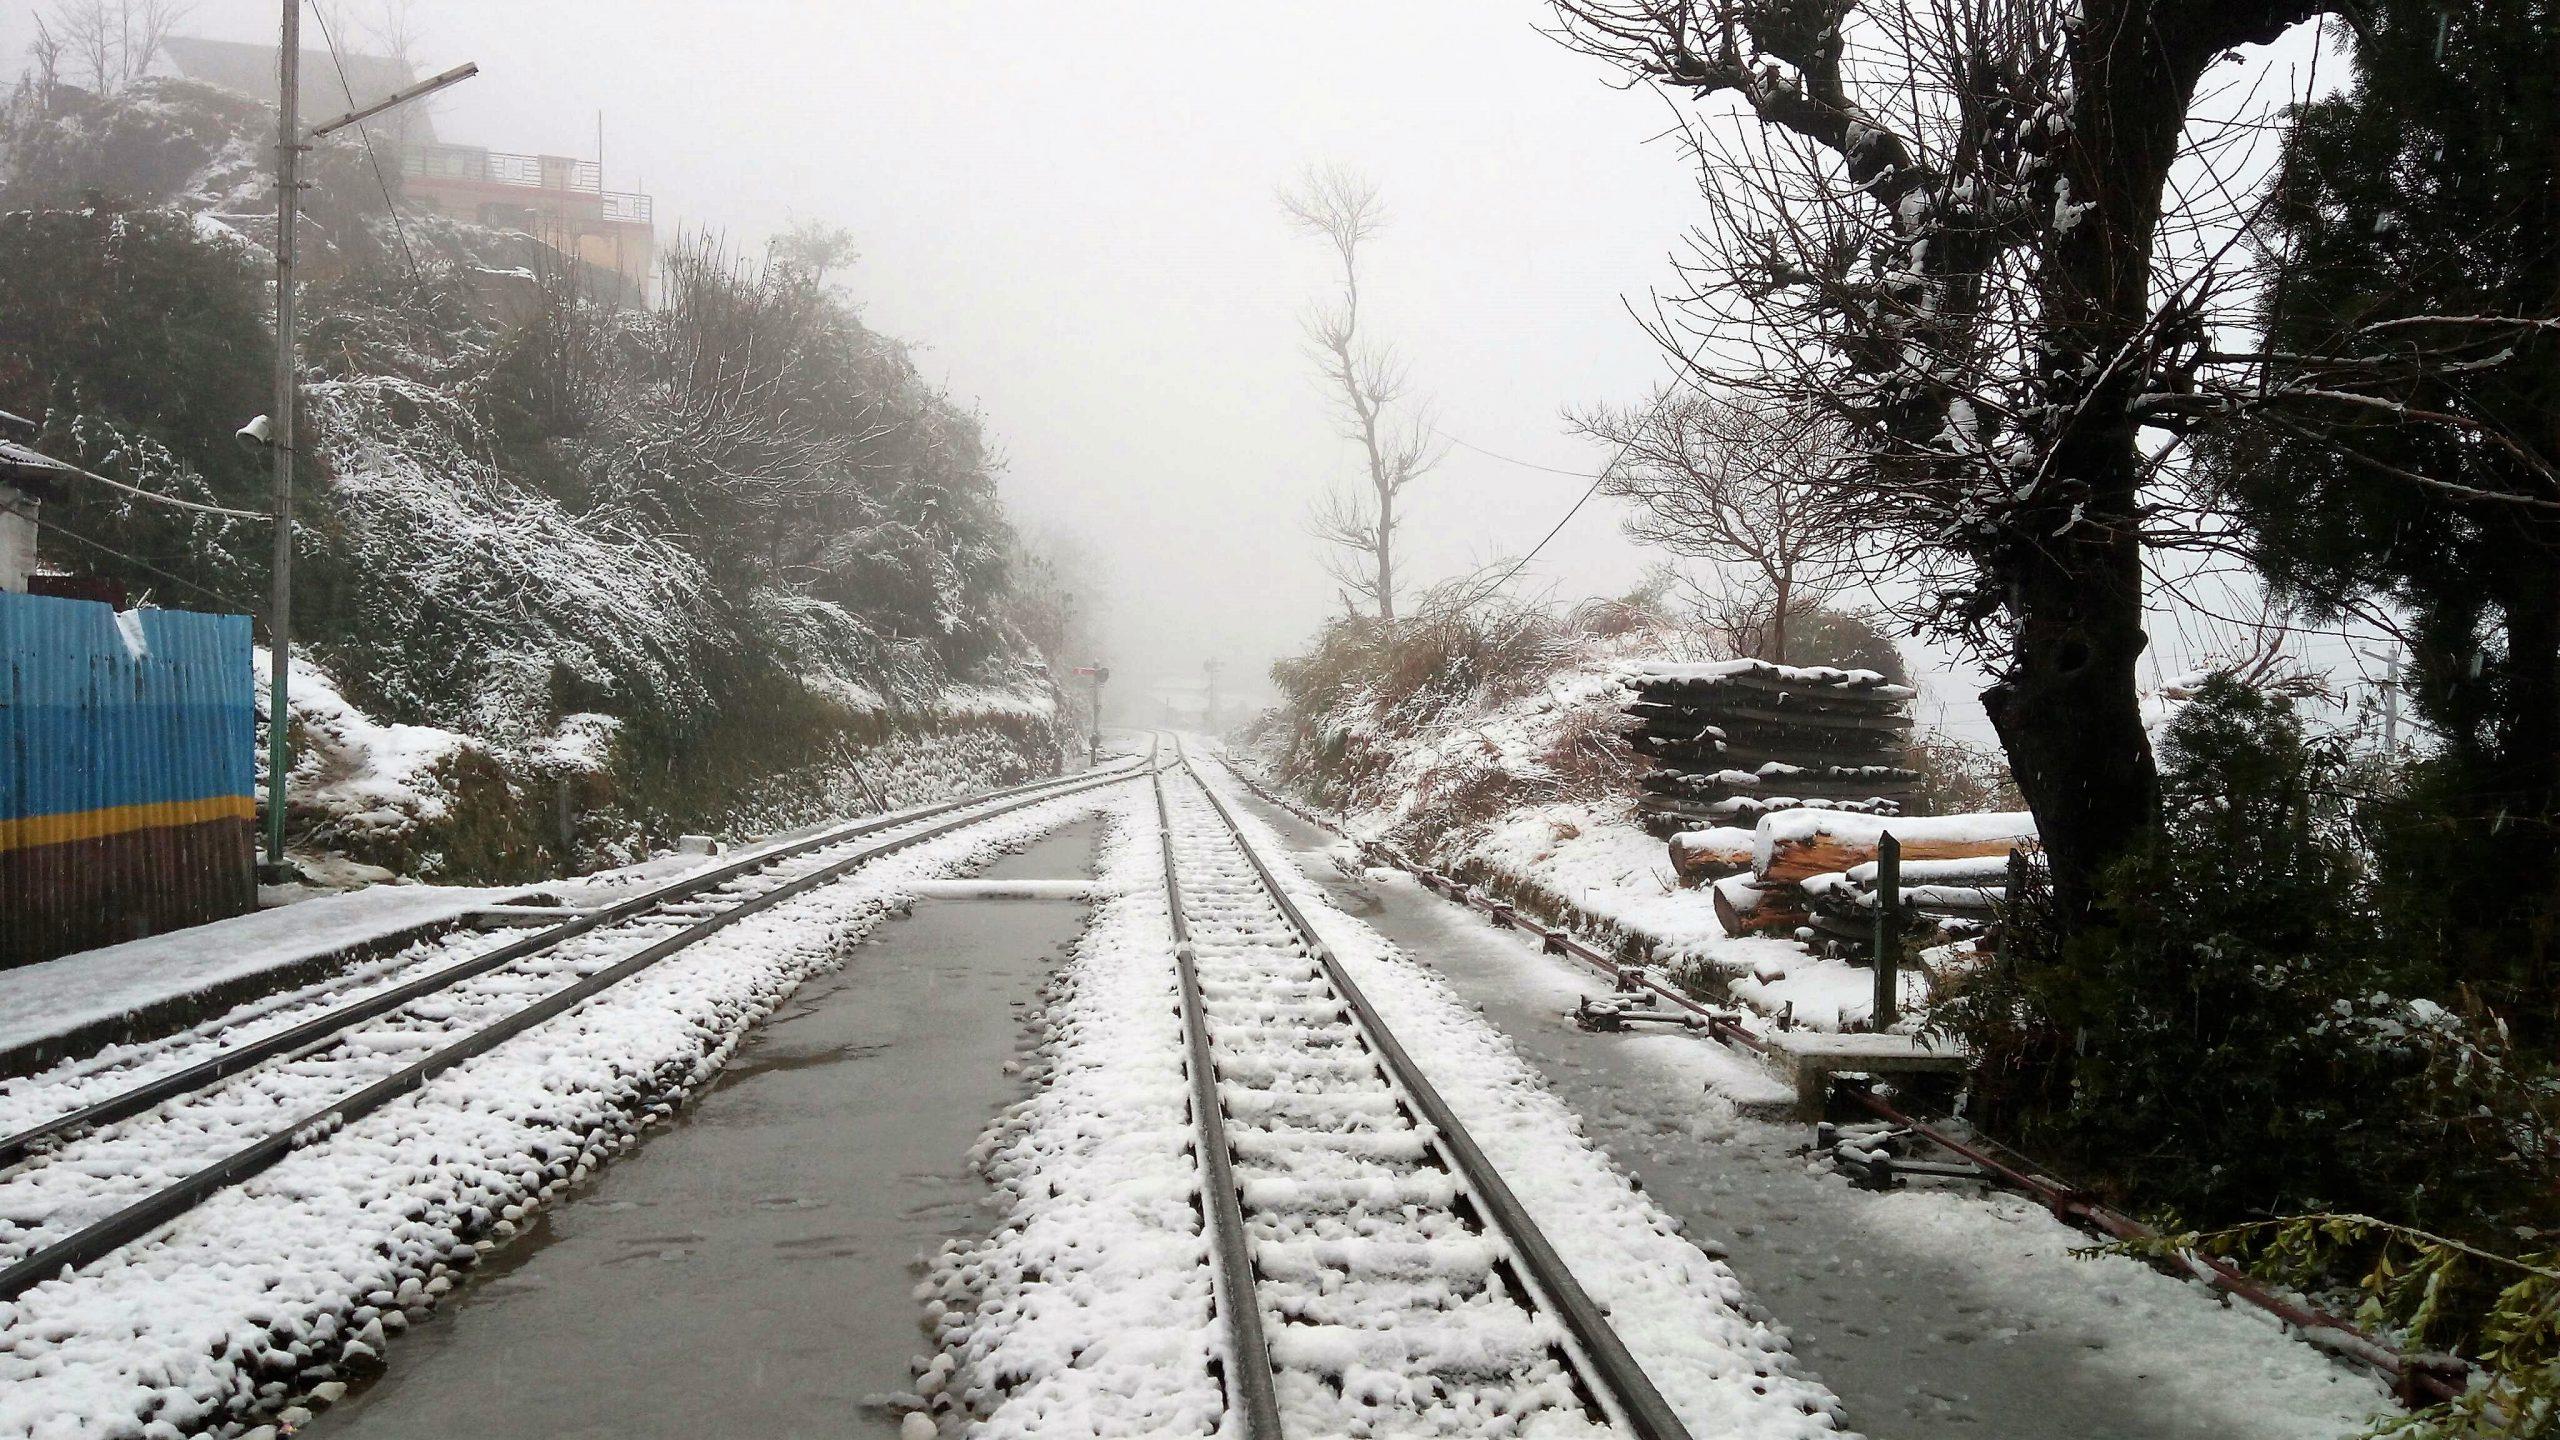 Snow Clad Railway Tracks